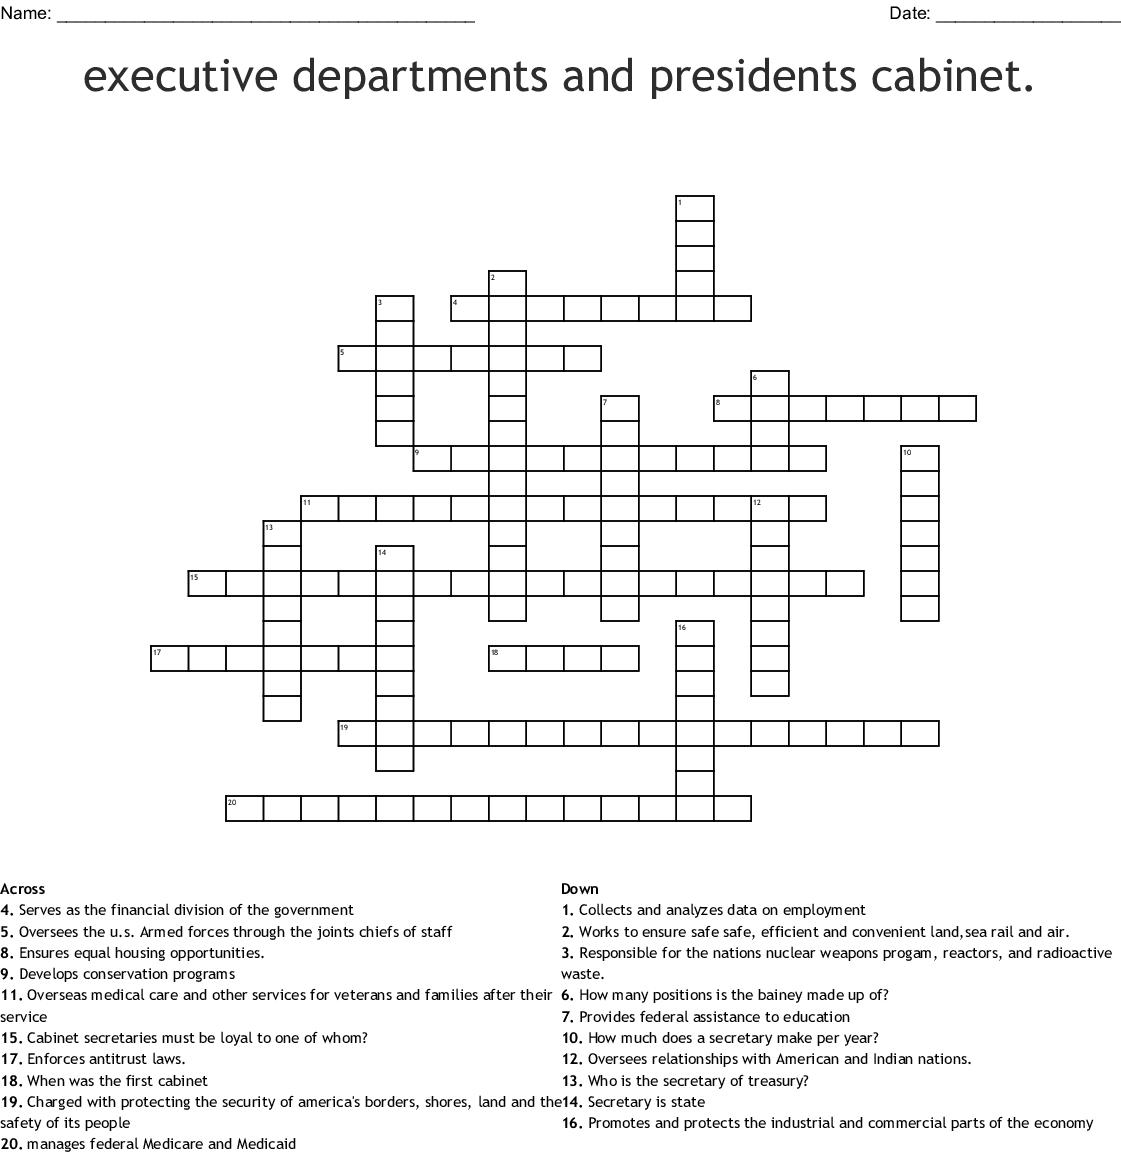 Worksheet On Cabinet Departments Quizlet